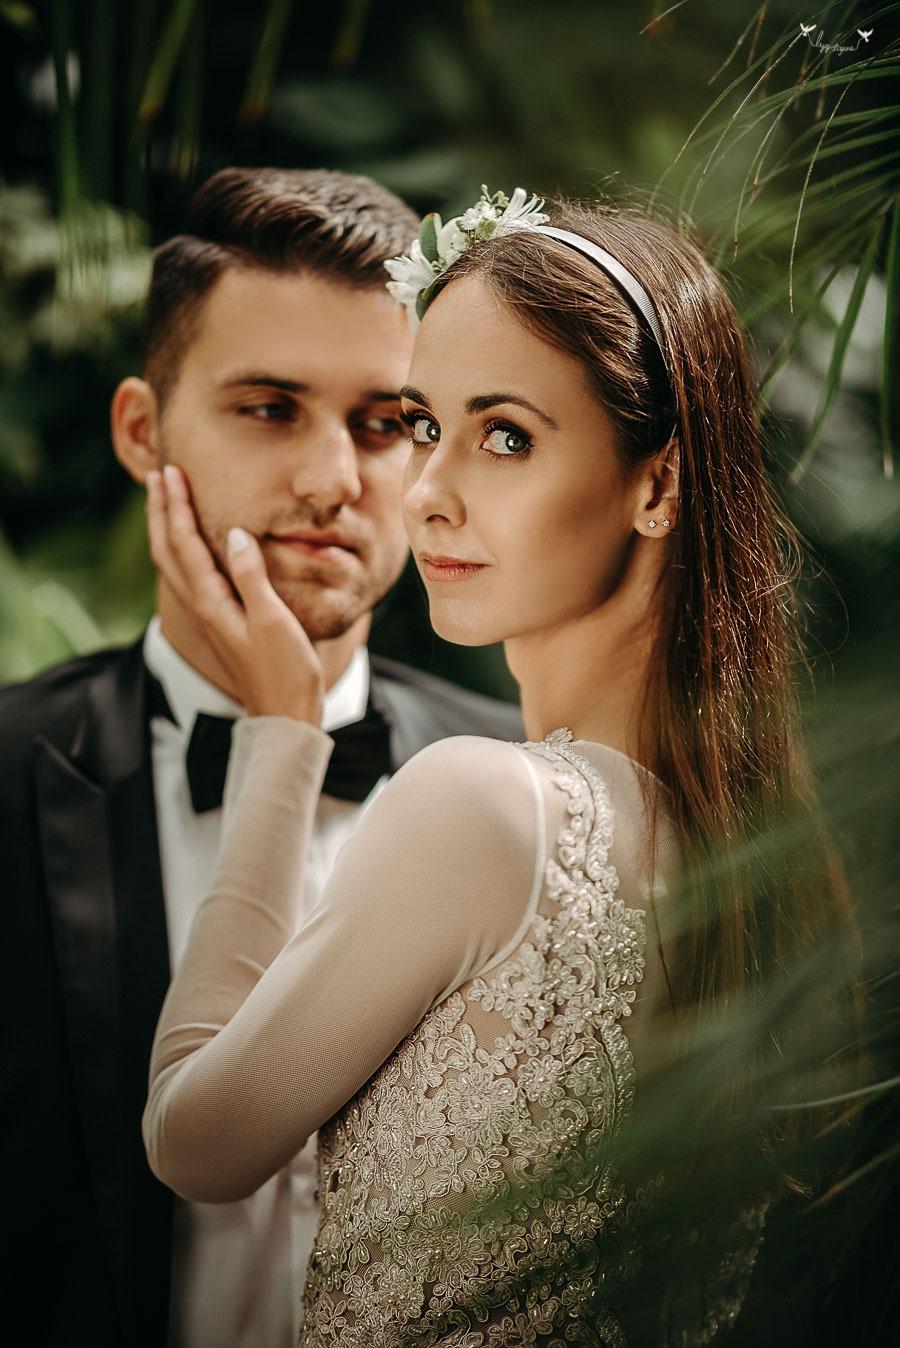 vestuviu fotosesija Kauno oranzerijoje